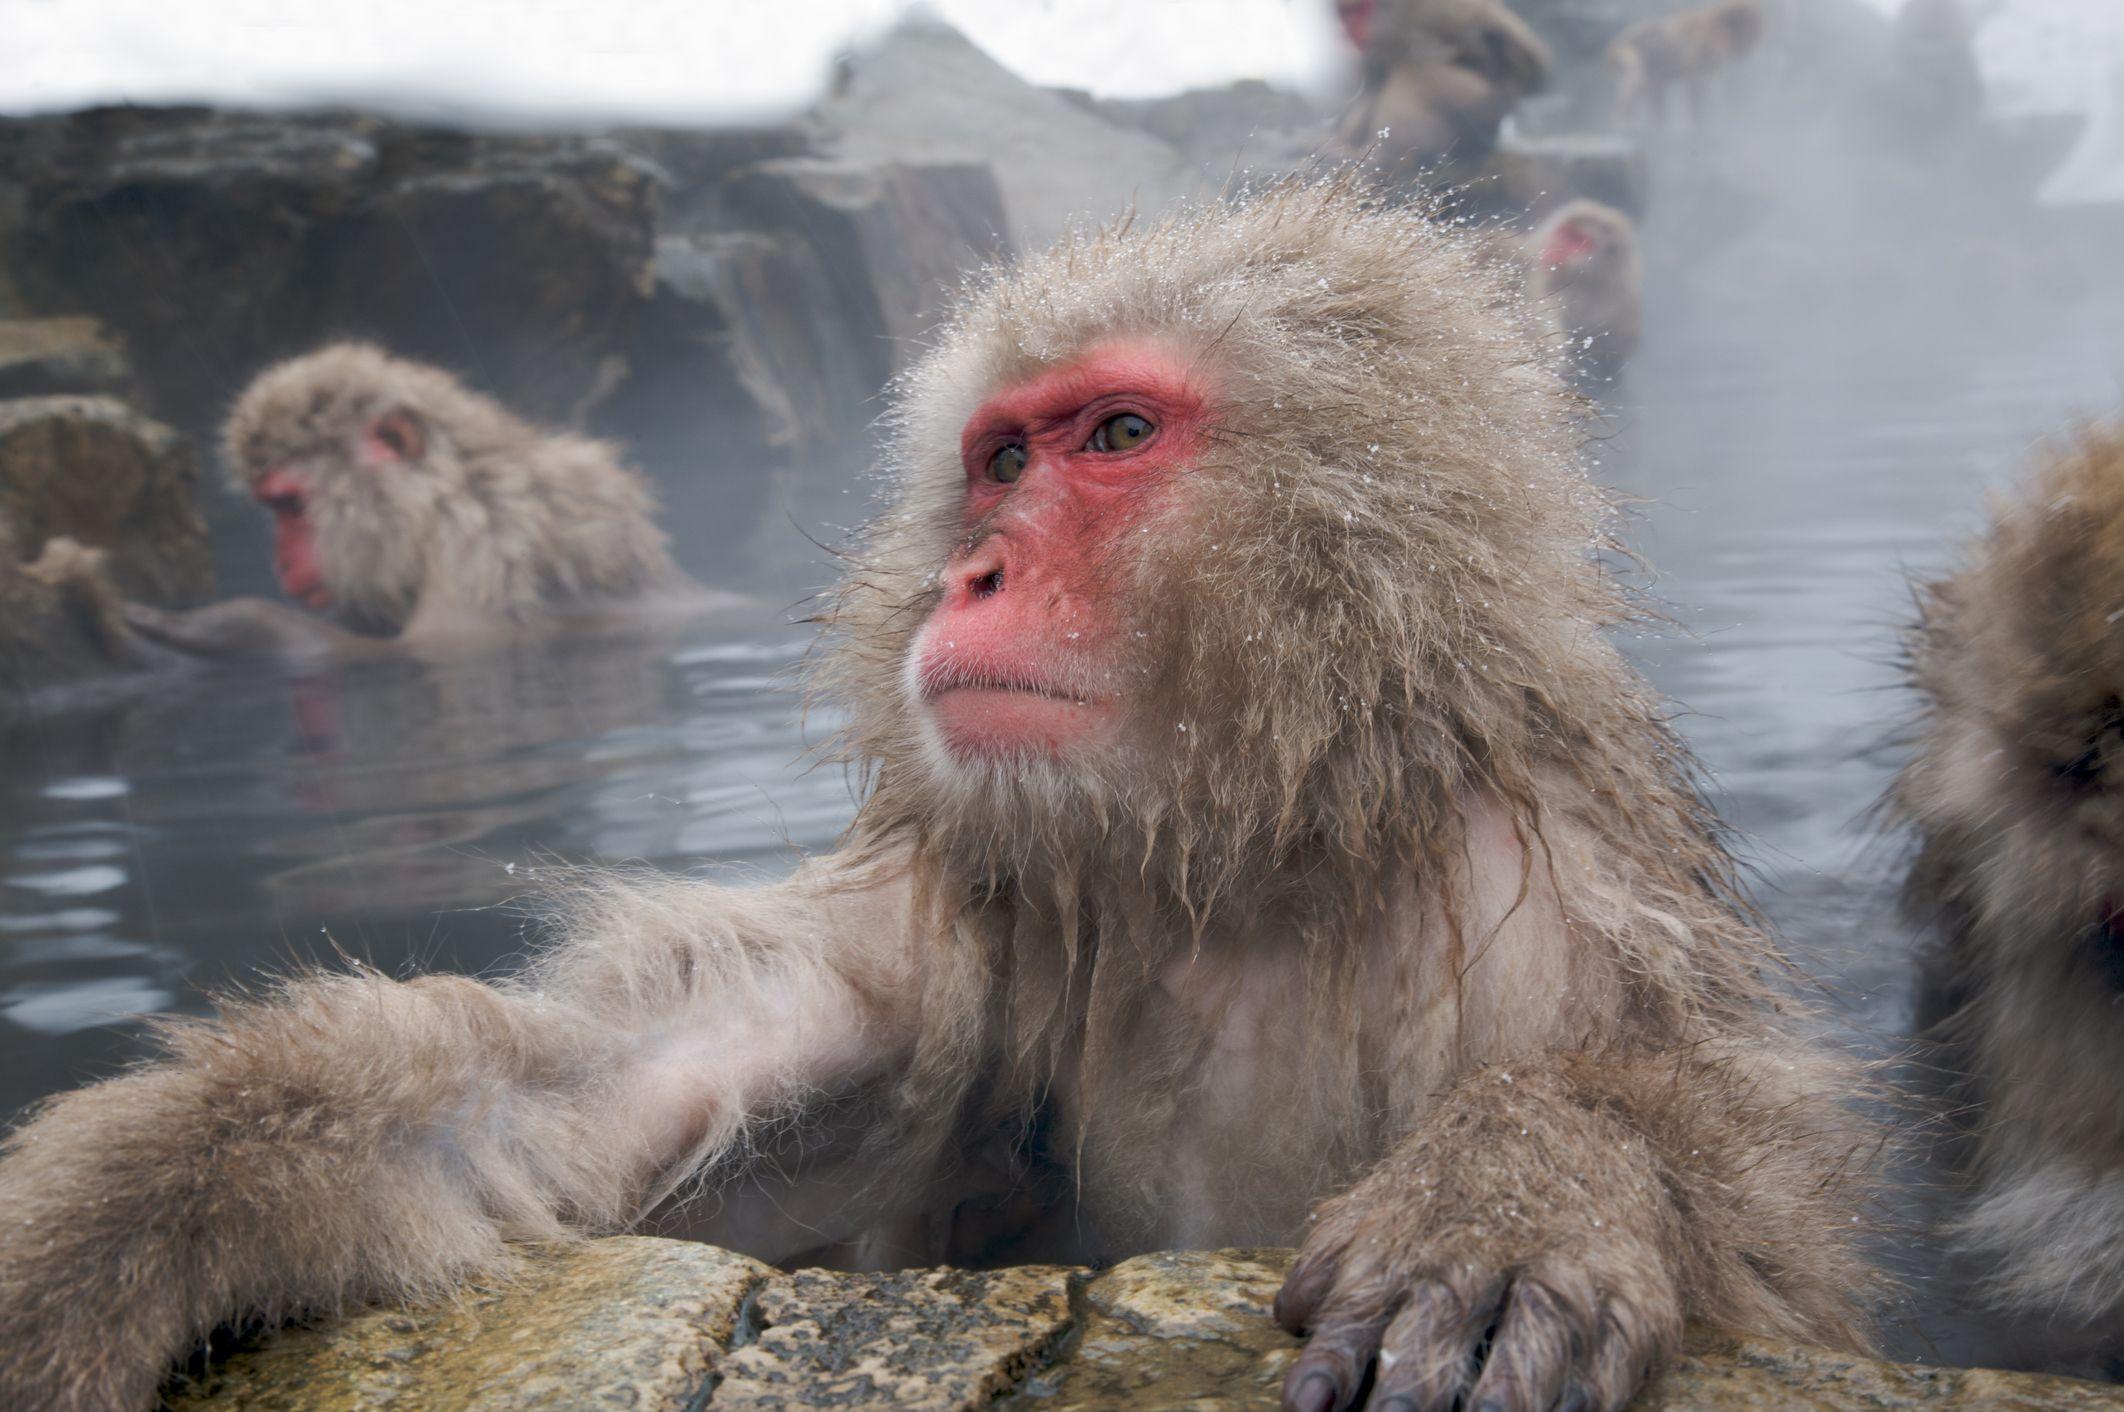 Snow Monkeys Love Hot Baths the Same Reasons Humans Do